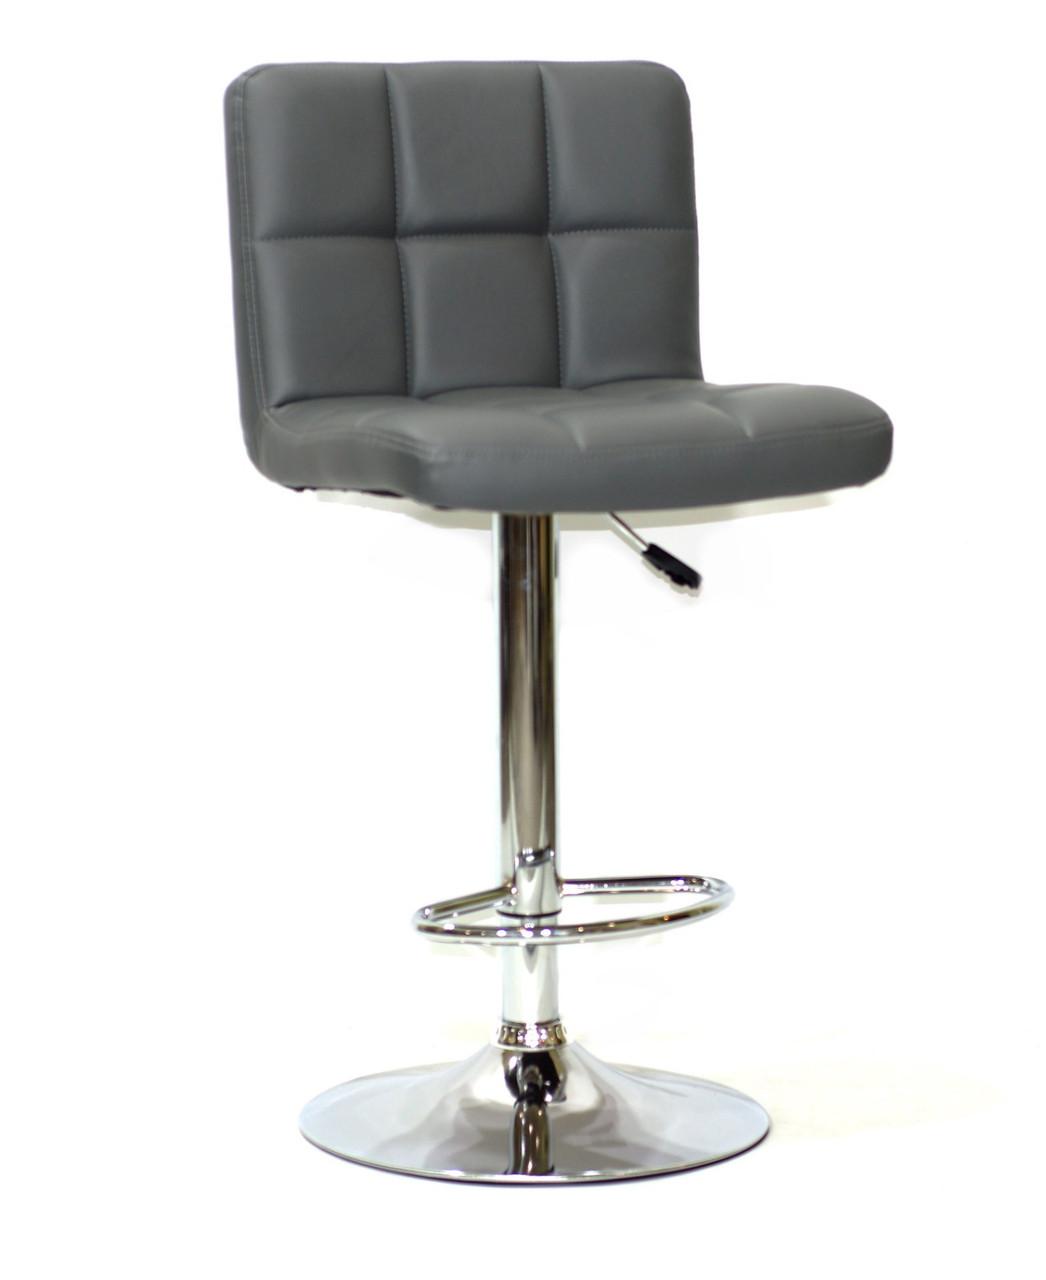 Барный стул Арно серый кожзам + хром/ Arno  BAR CH - Base